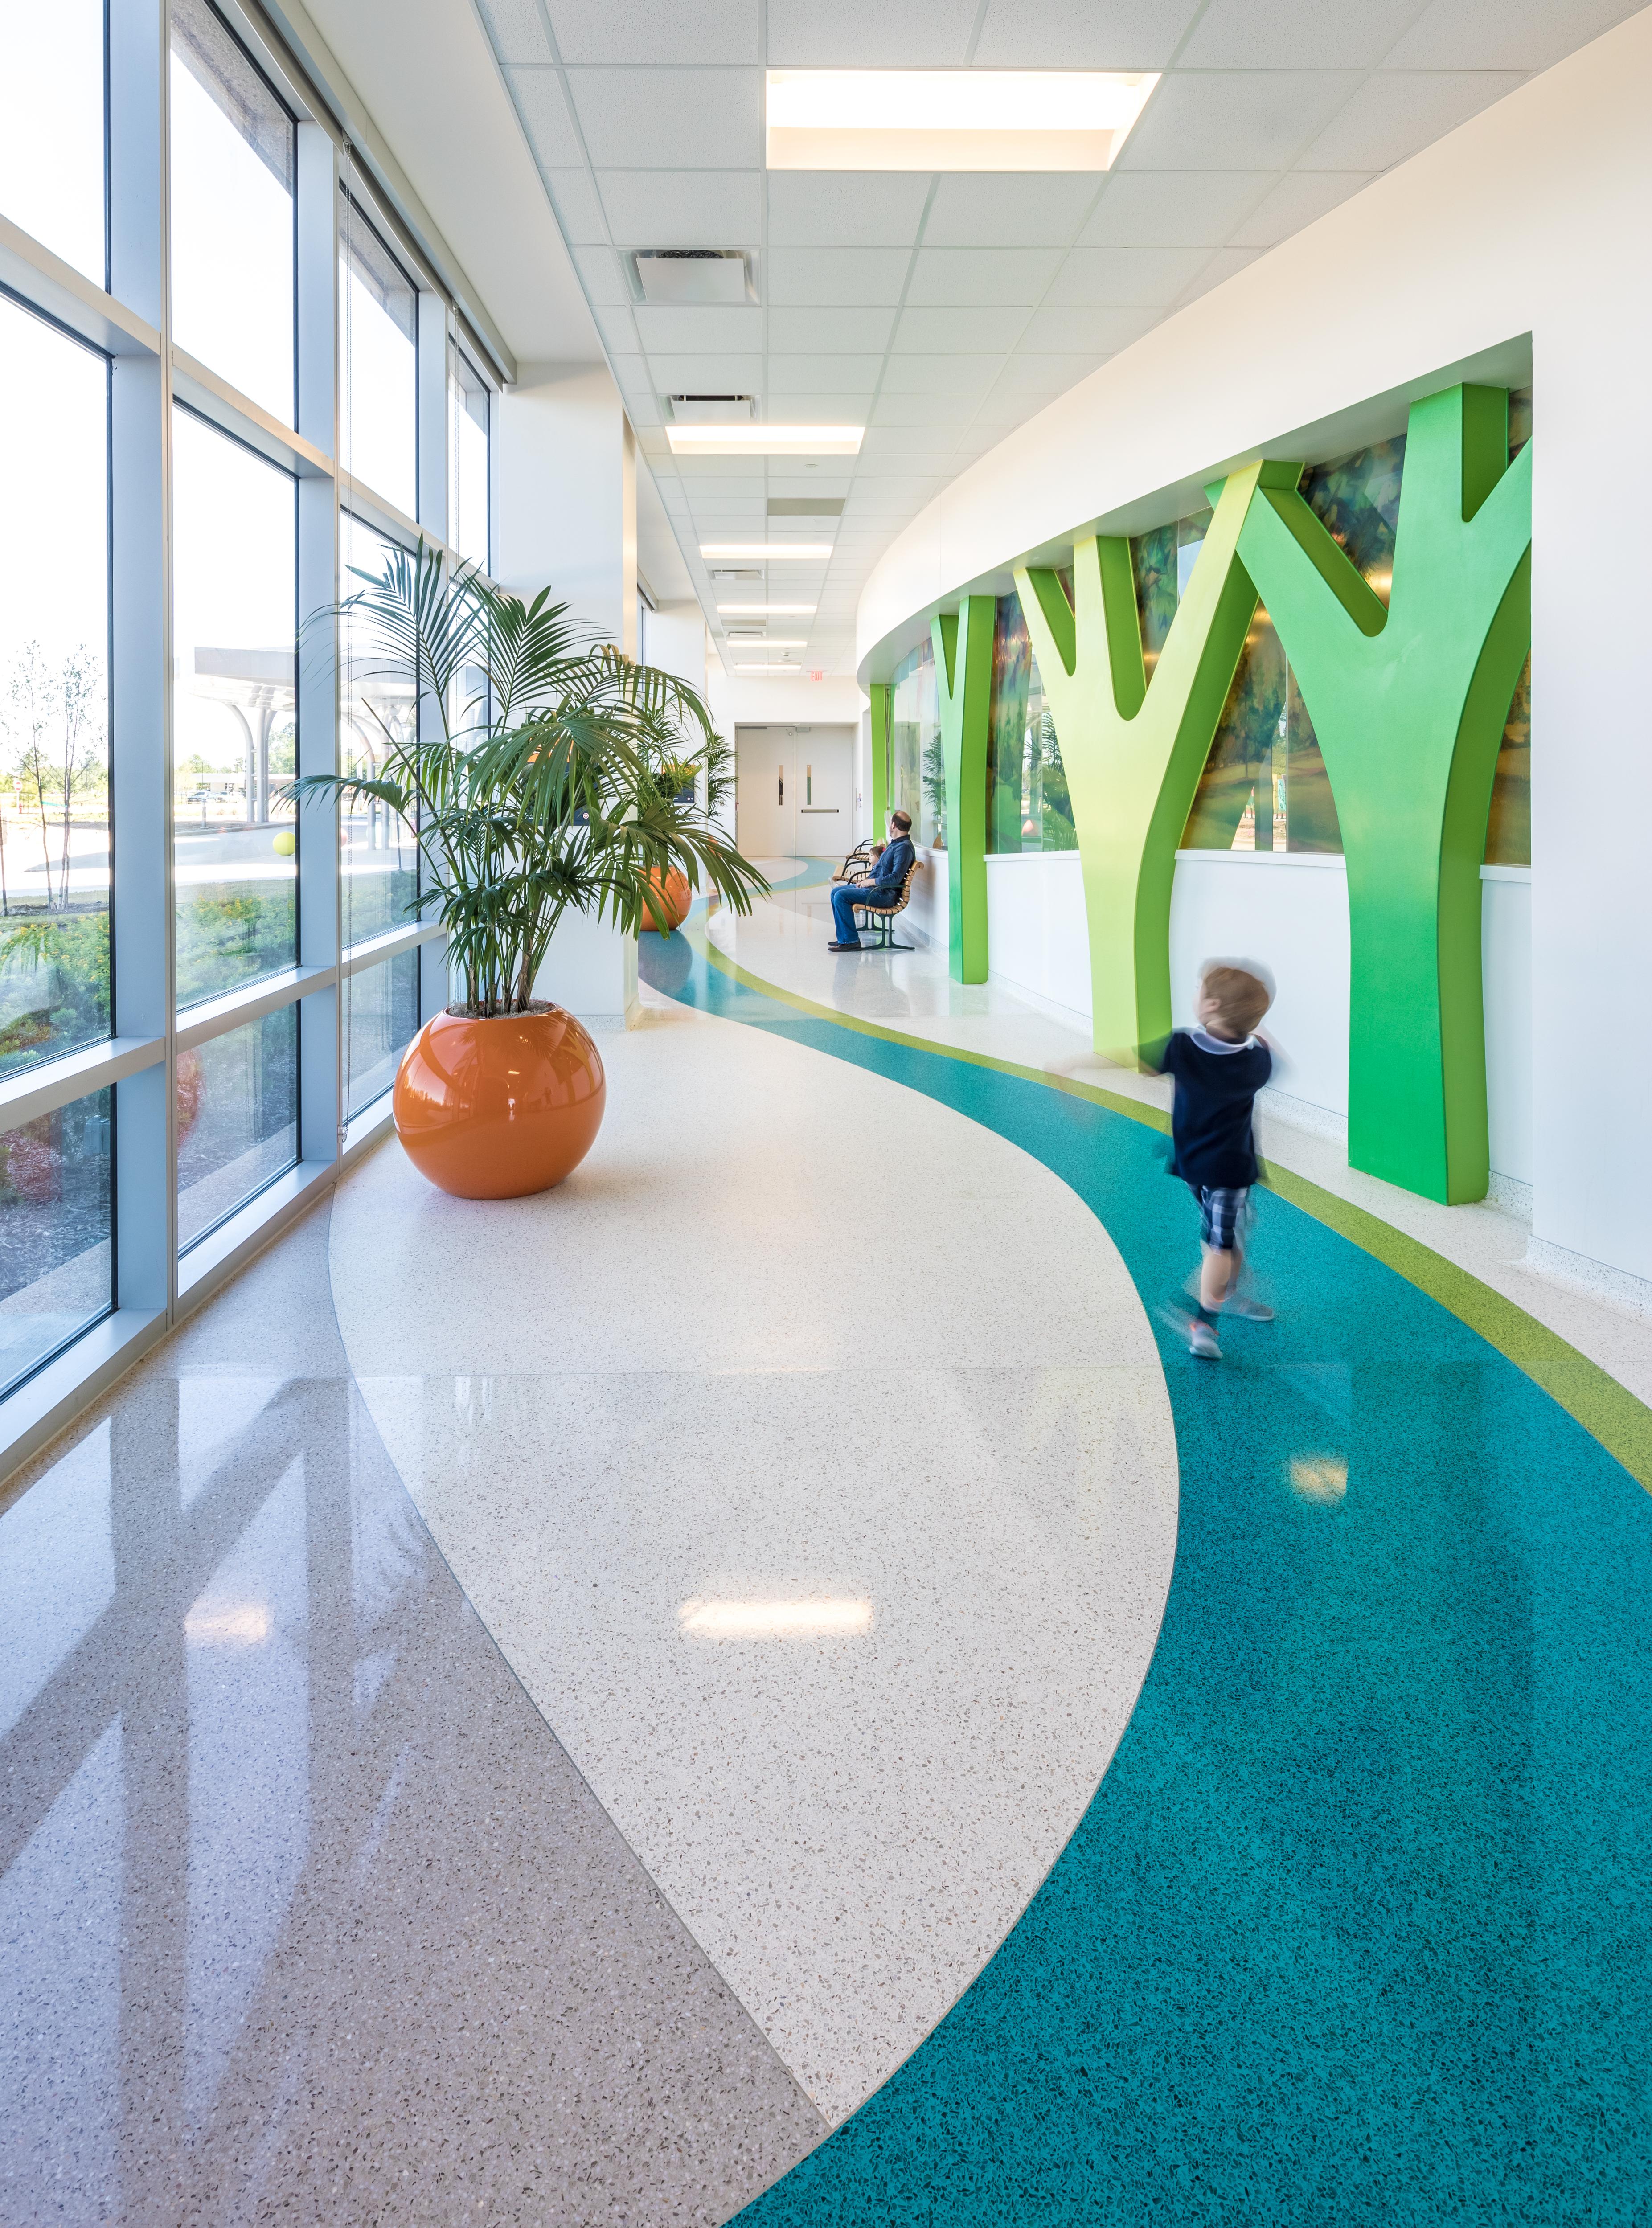 Texas_Childrens_hospital_Caragreen